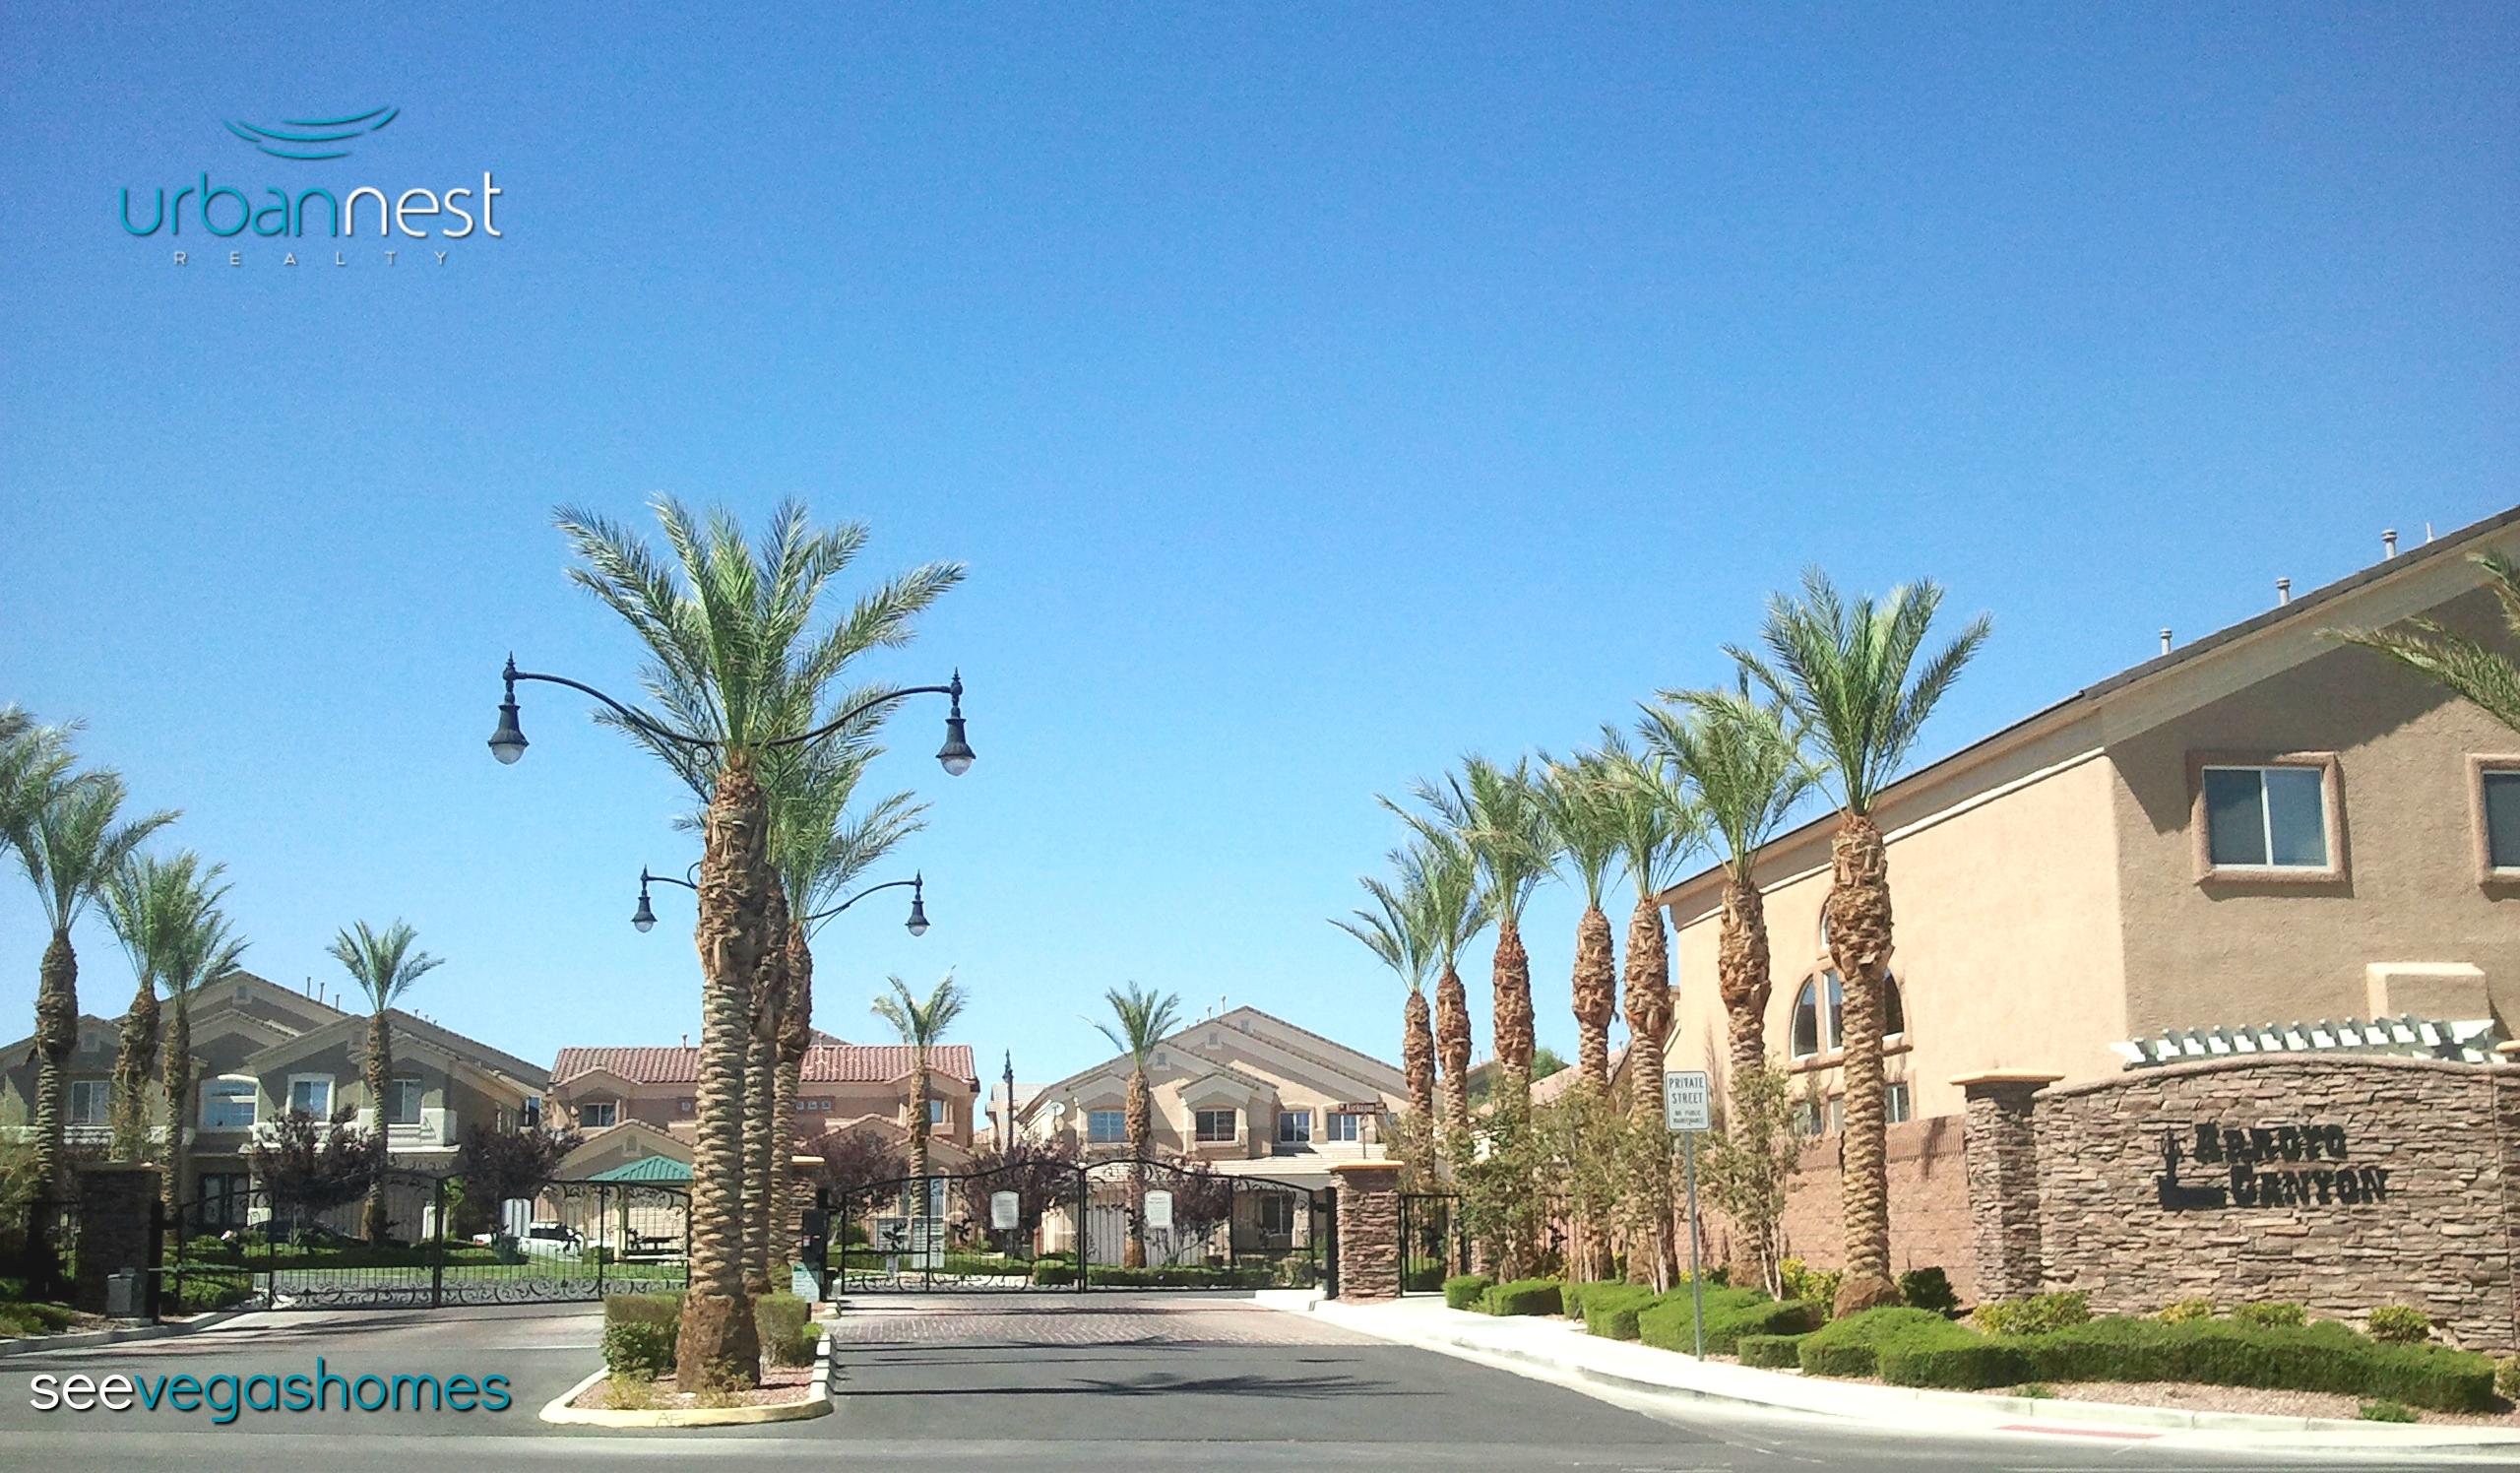 Arroyo Canyon Las Vegas NV 89149 SeeVegasHomes